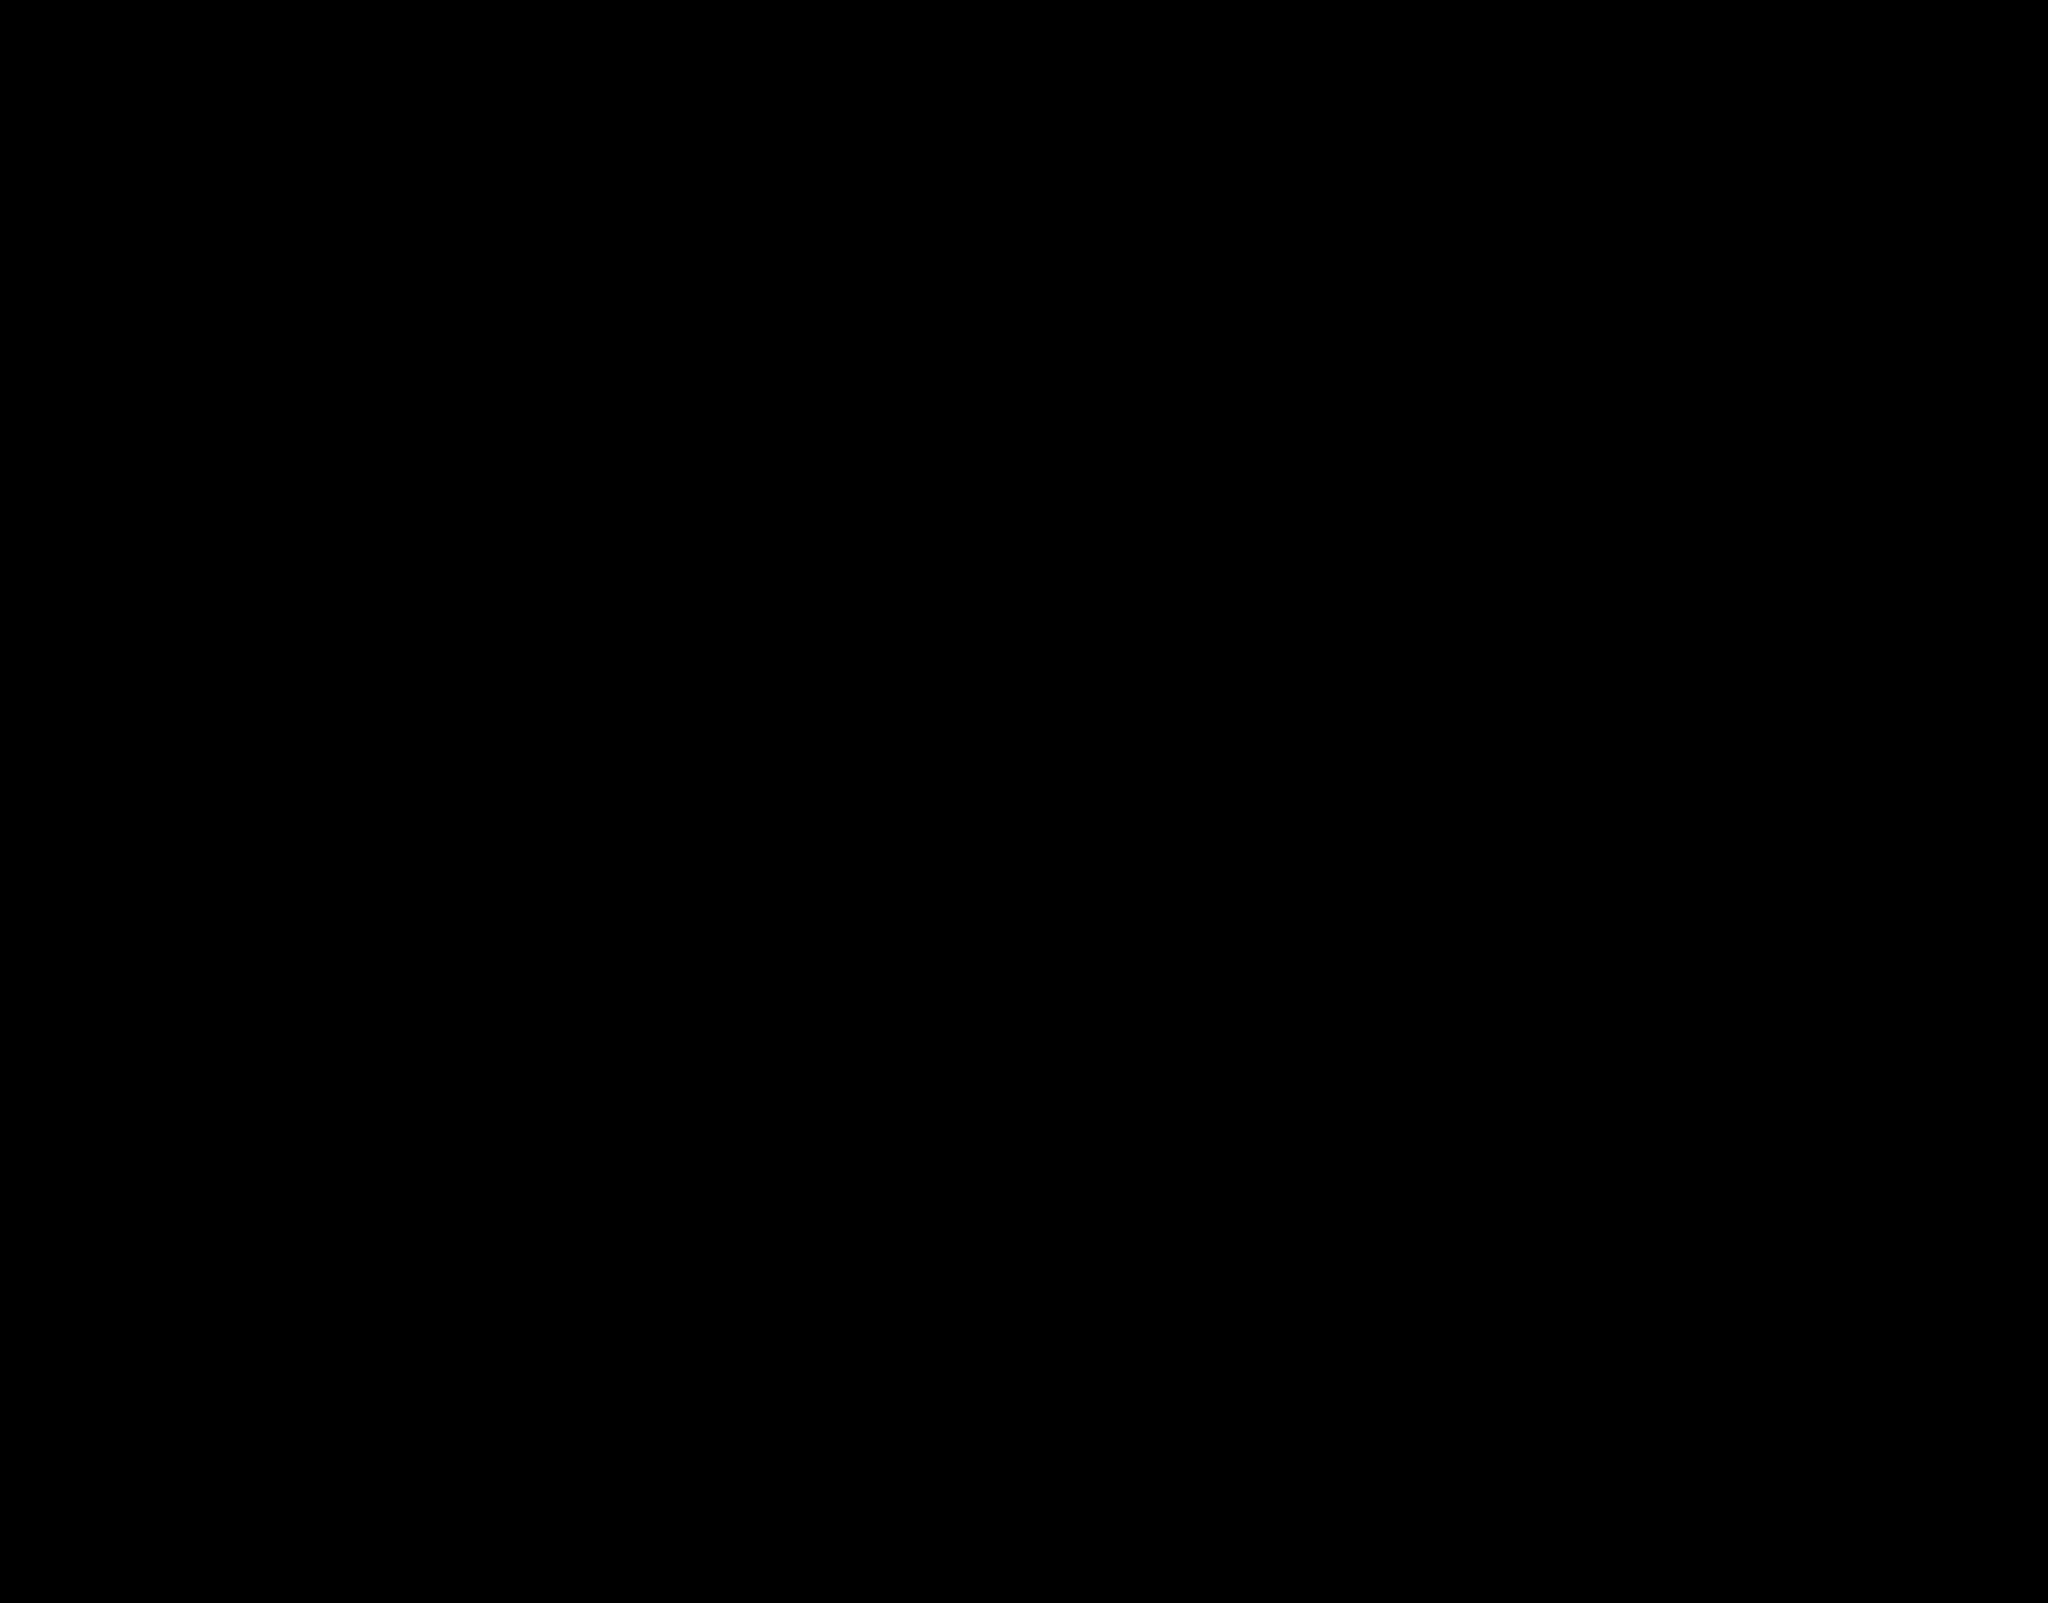 Kuchyňská baterie SCHOCK LEVA Cristalite+® Nero 511120